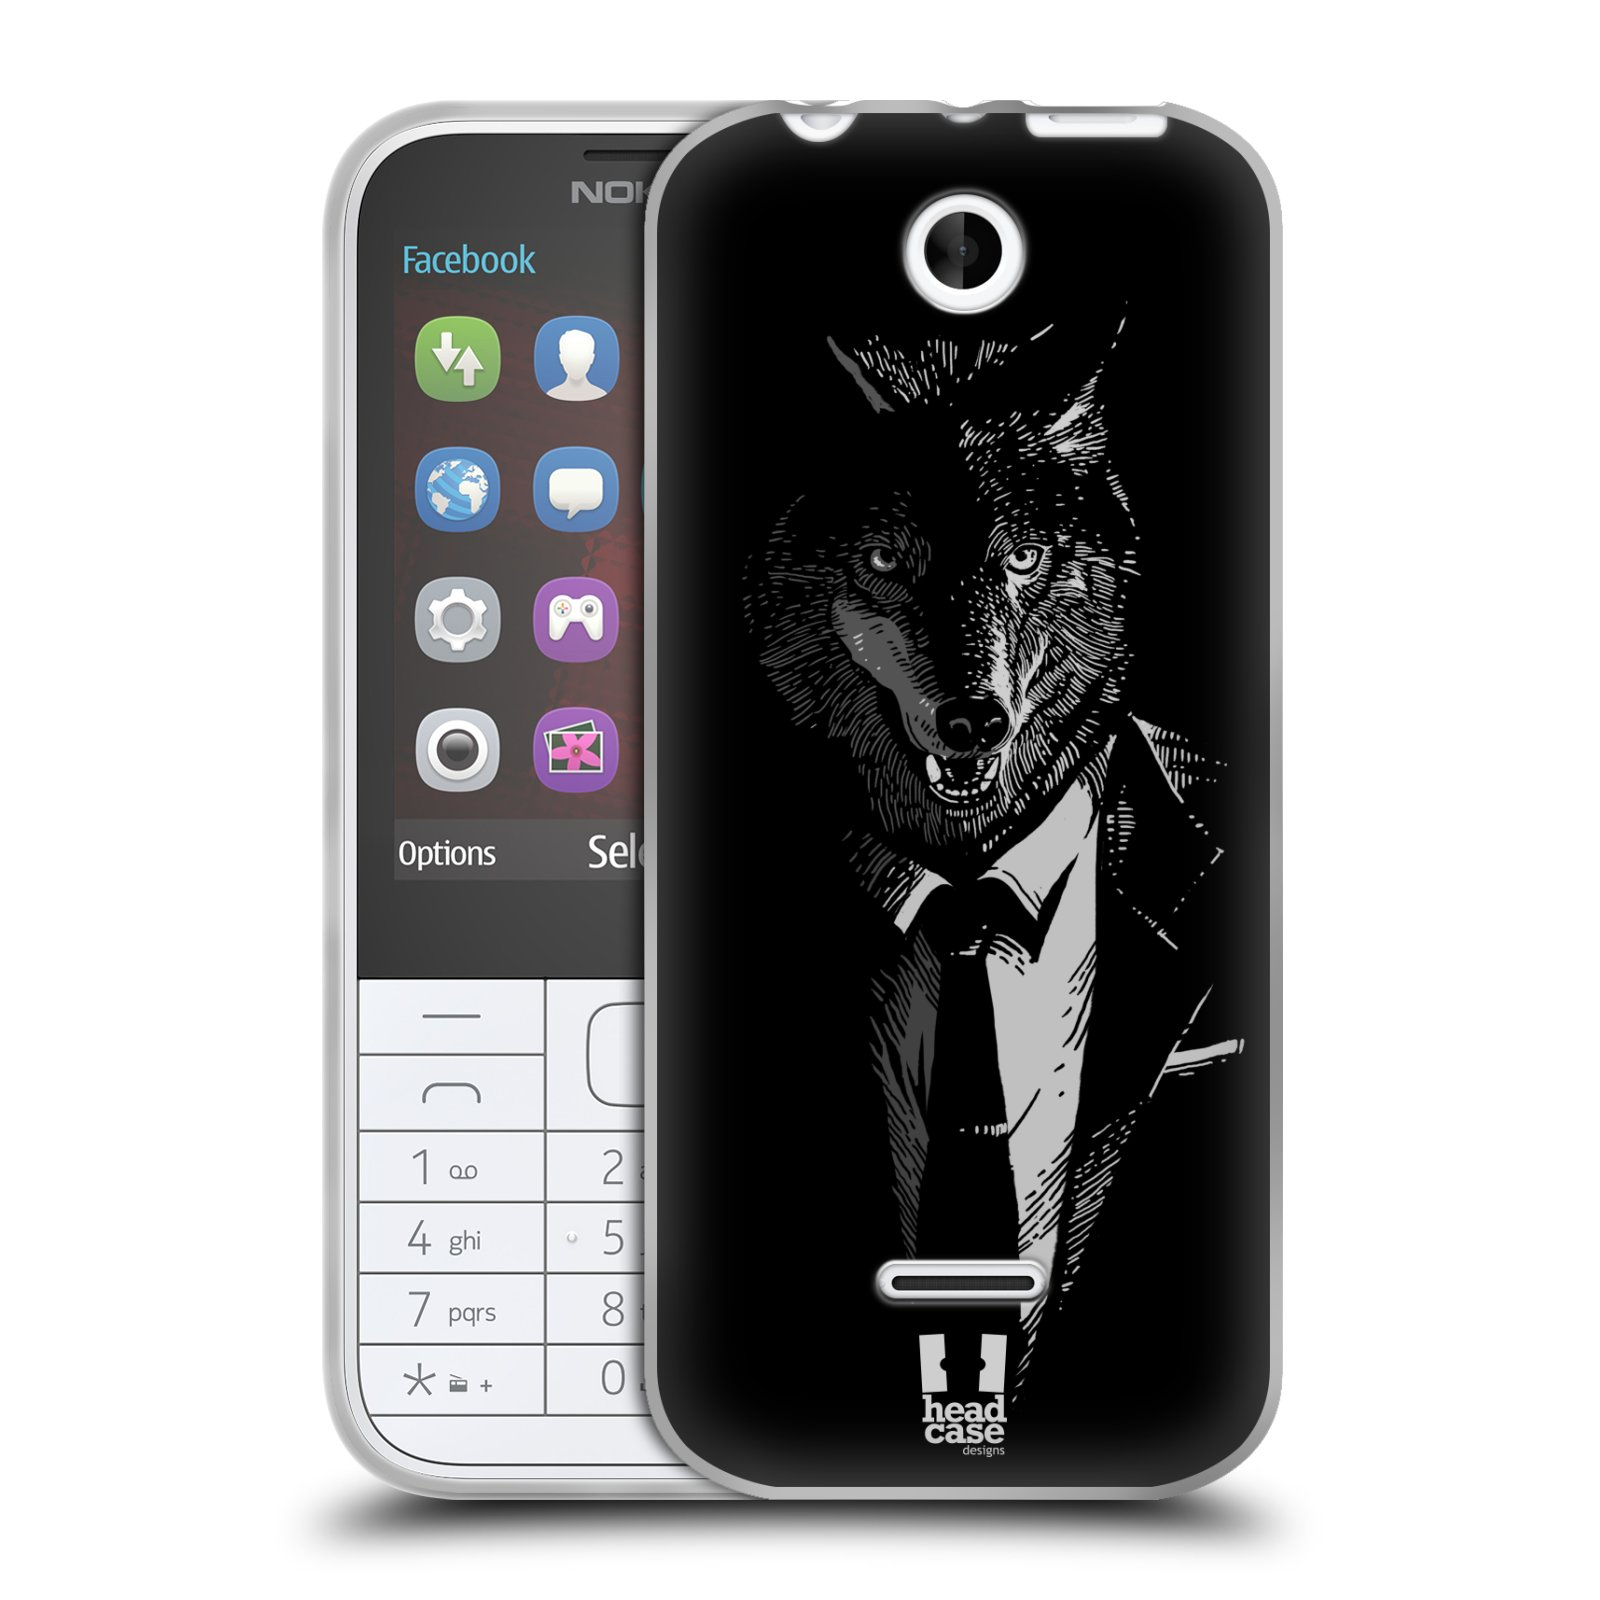 Silikonové pouzdro na mobil Nokia 225 HEAD CASE VLK V KVÁDRU (Silikonový kryt či obal na mobilní telefon Nokia 225)